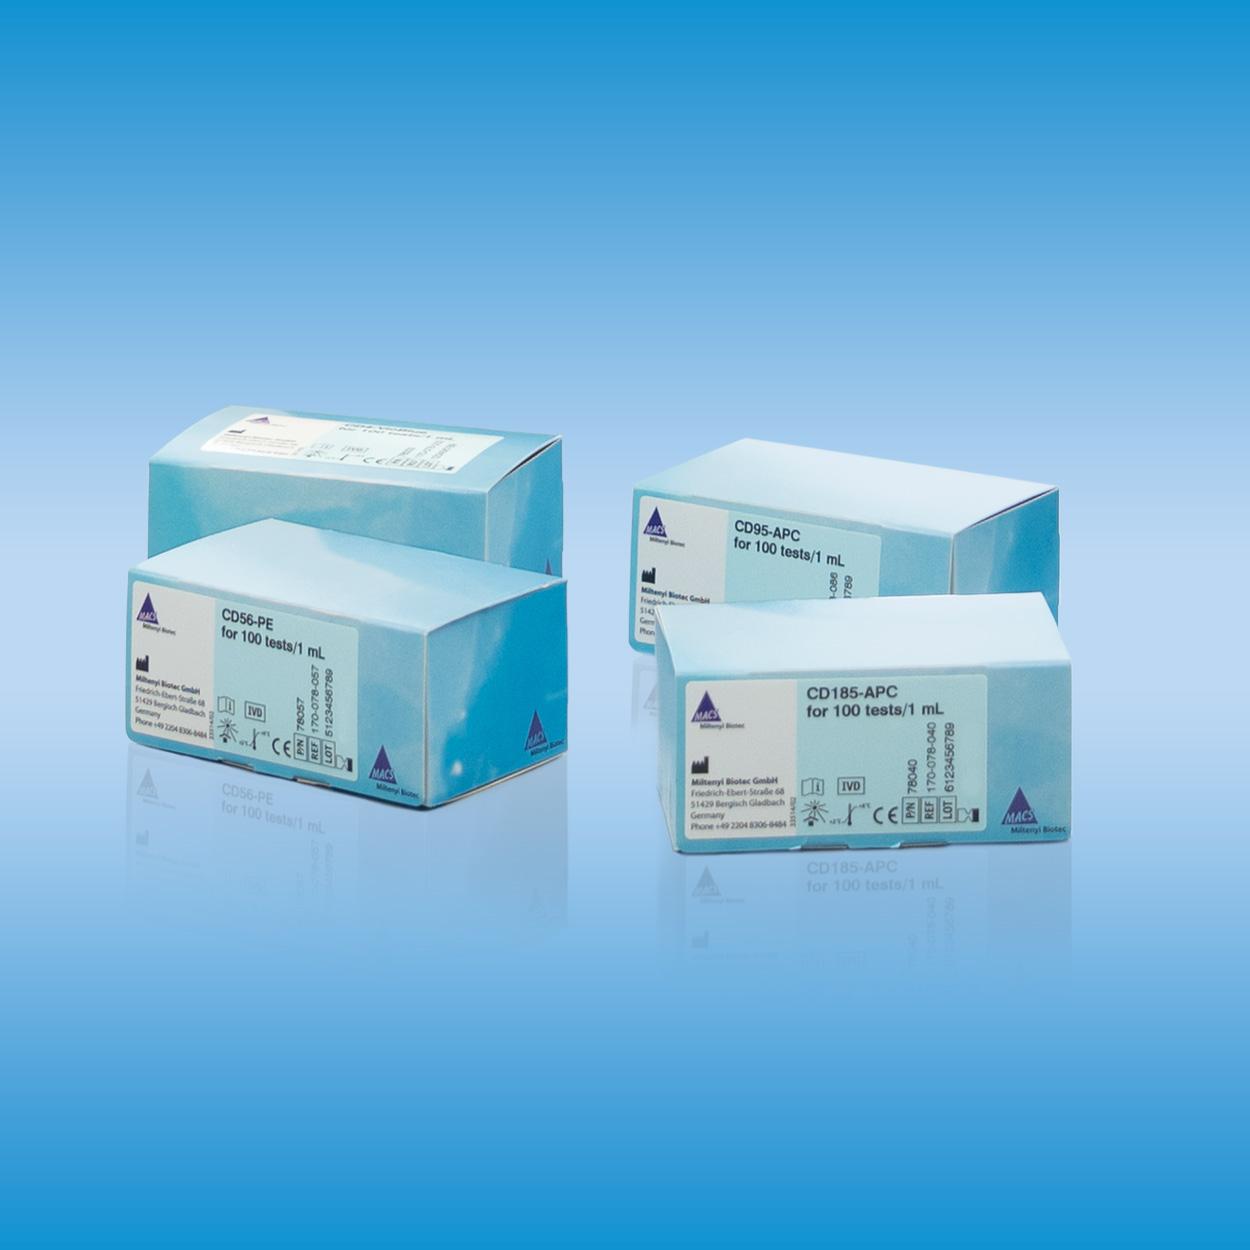 CD62L antibodies